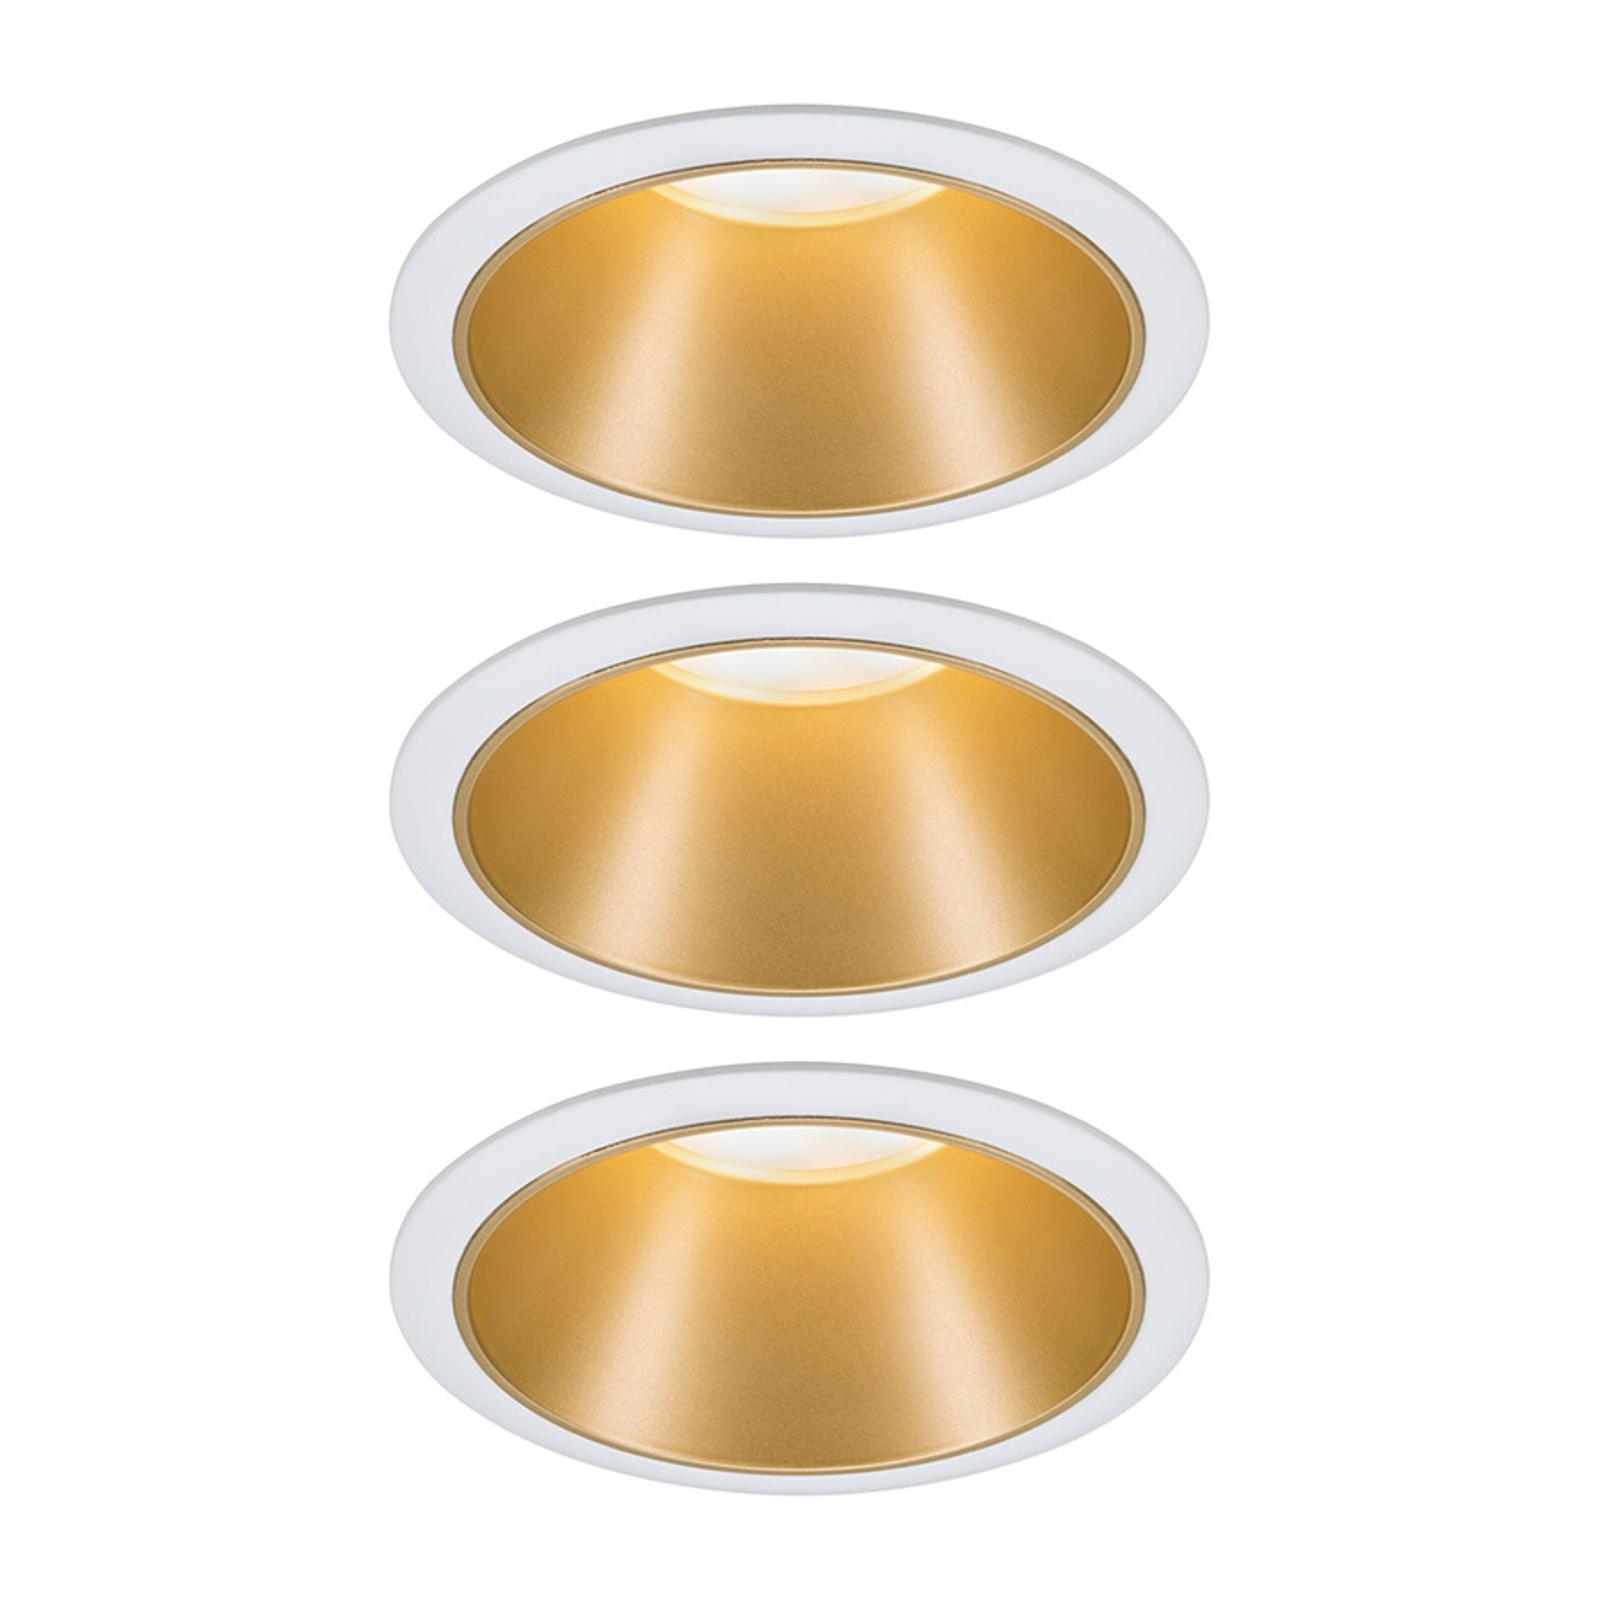 Paulmann Cole LED spotlight, zlatobílý, 3ks